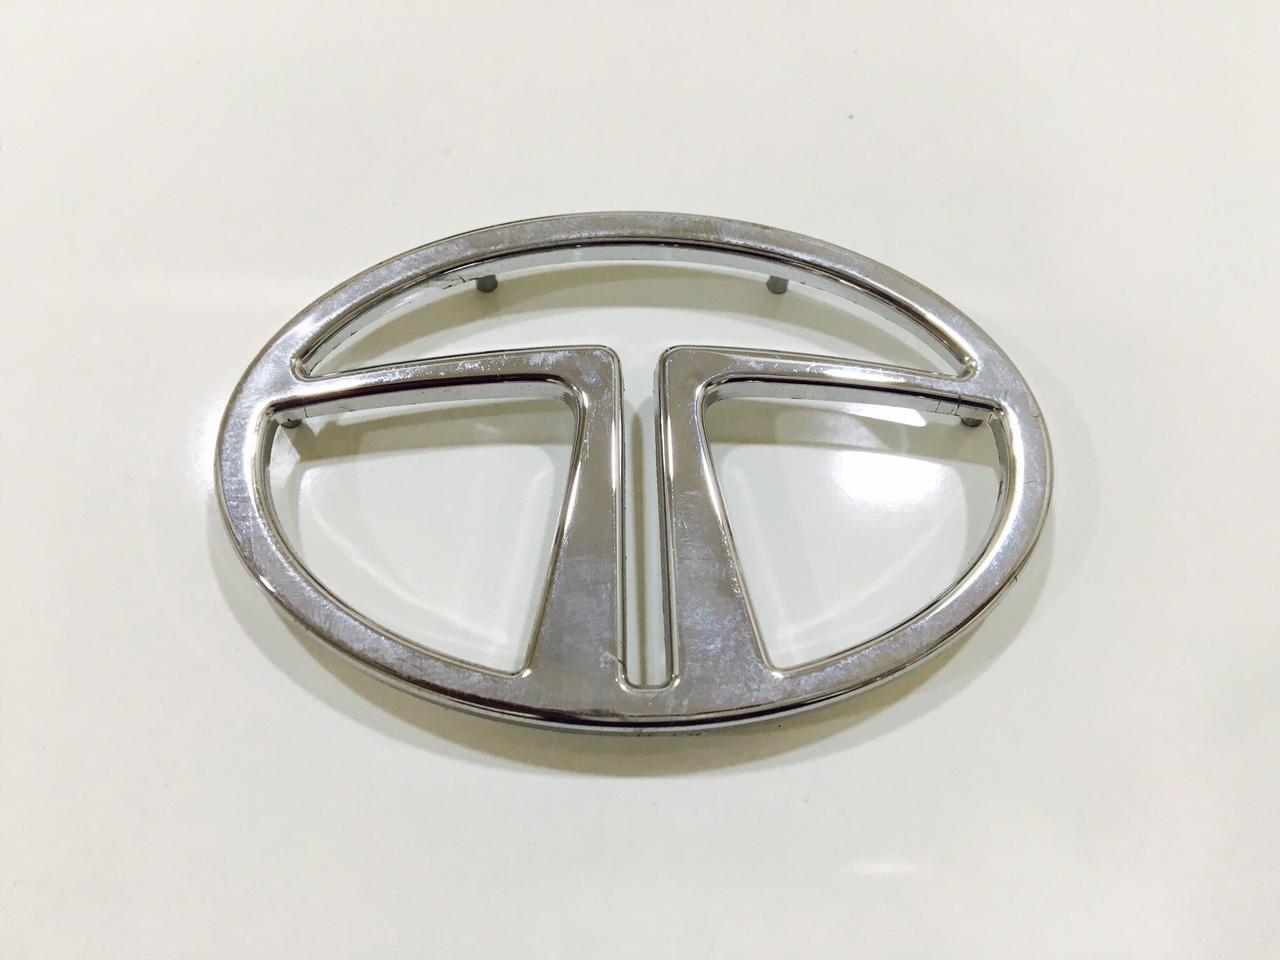 TATA logo - Chrome Plated